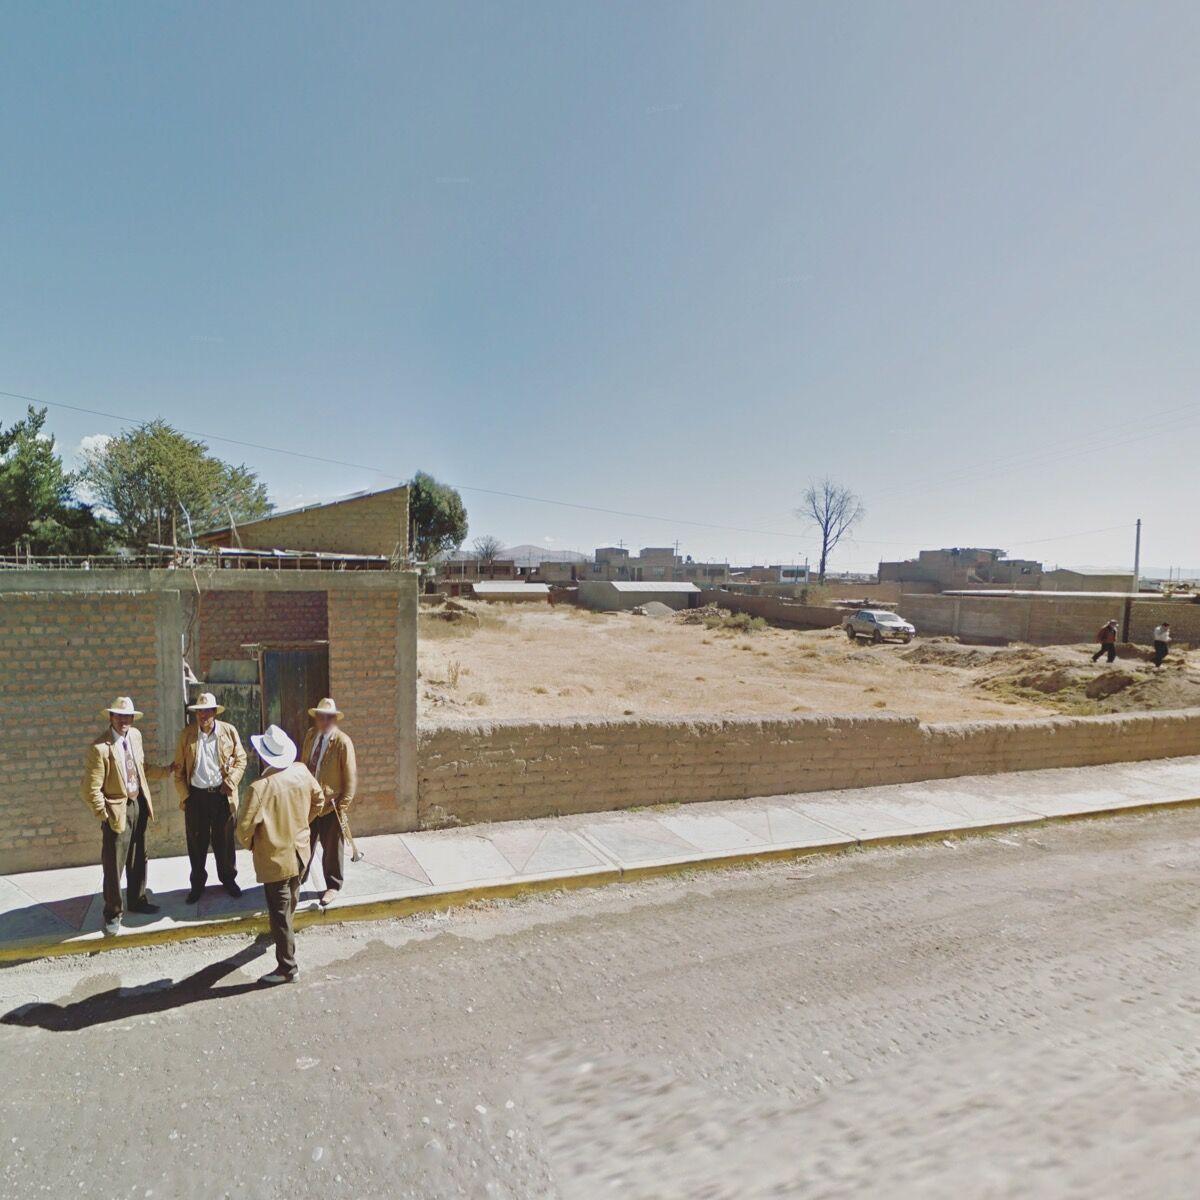 Cabanillas, Puno, Peru. Photograph by Jacqui Kenny via Google Street View.